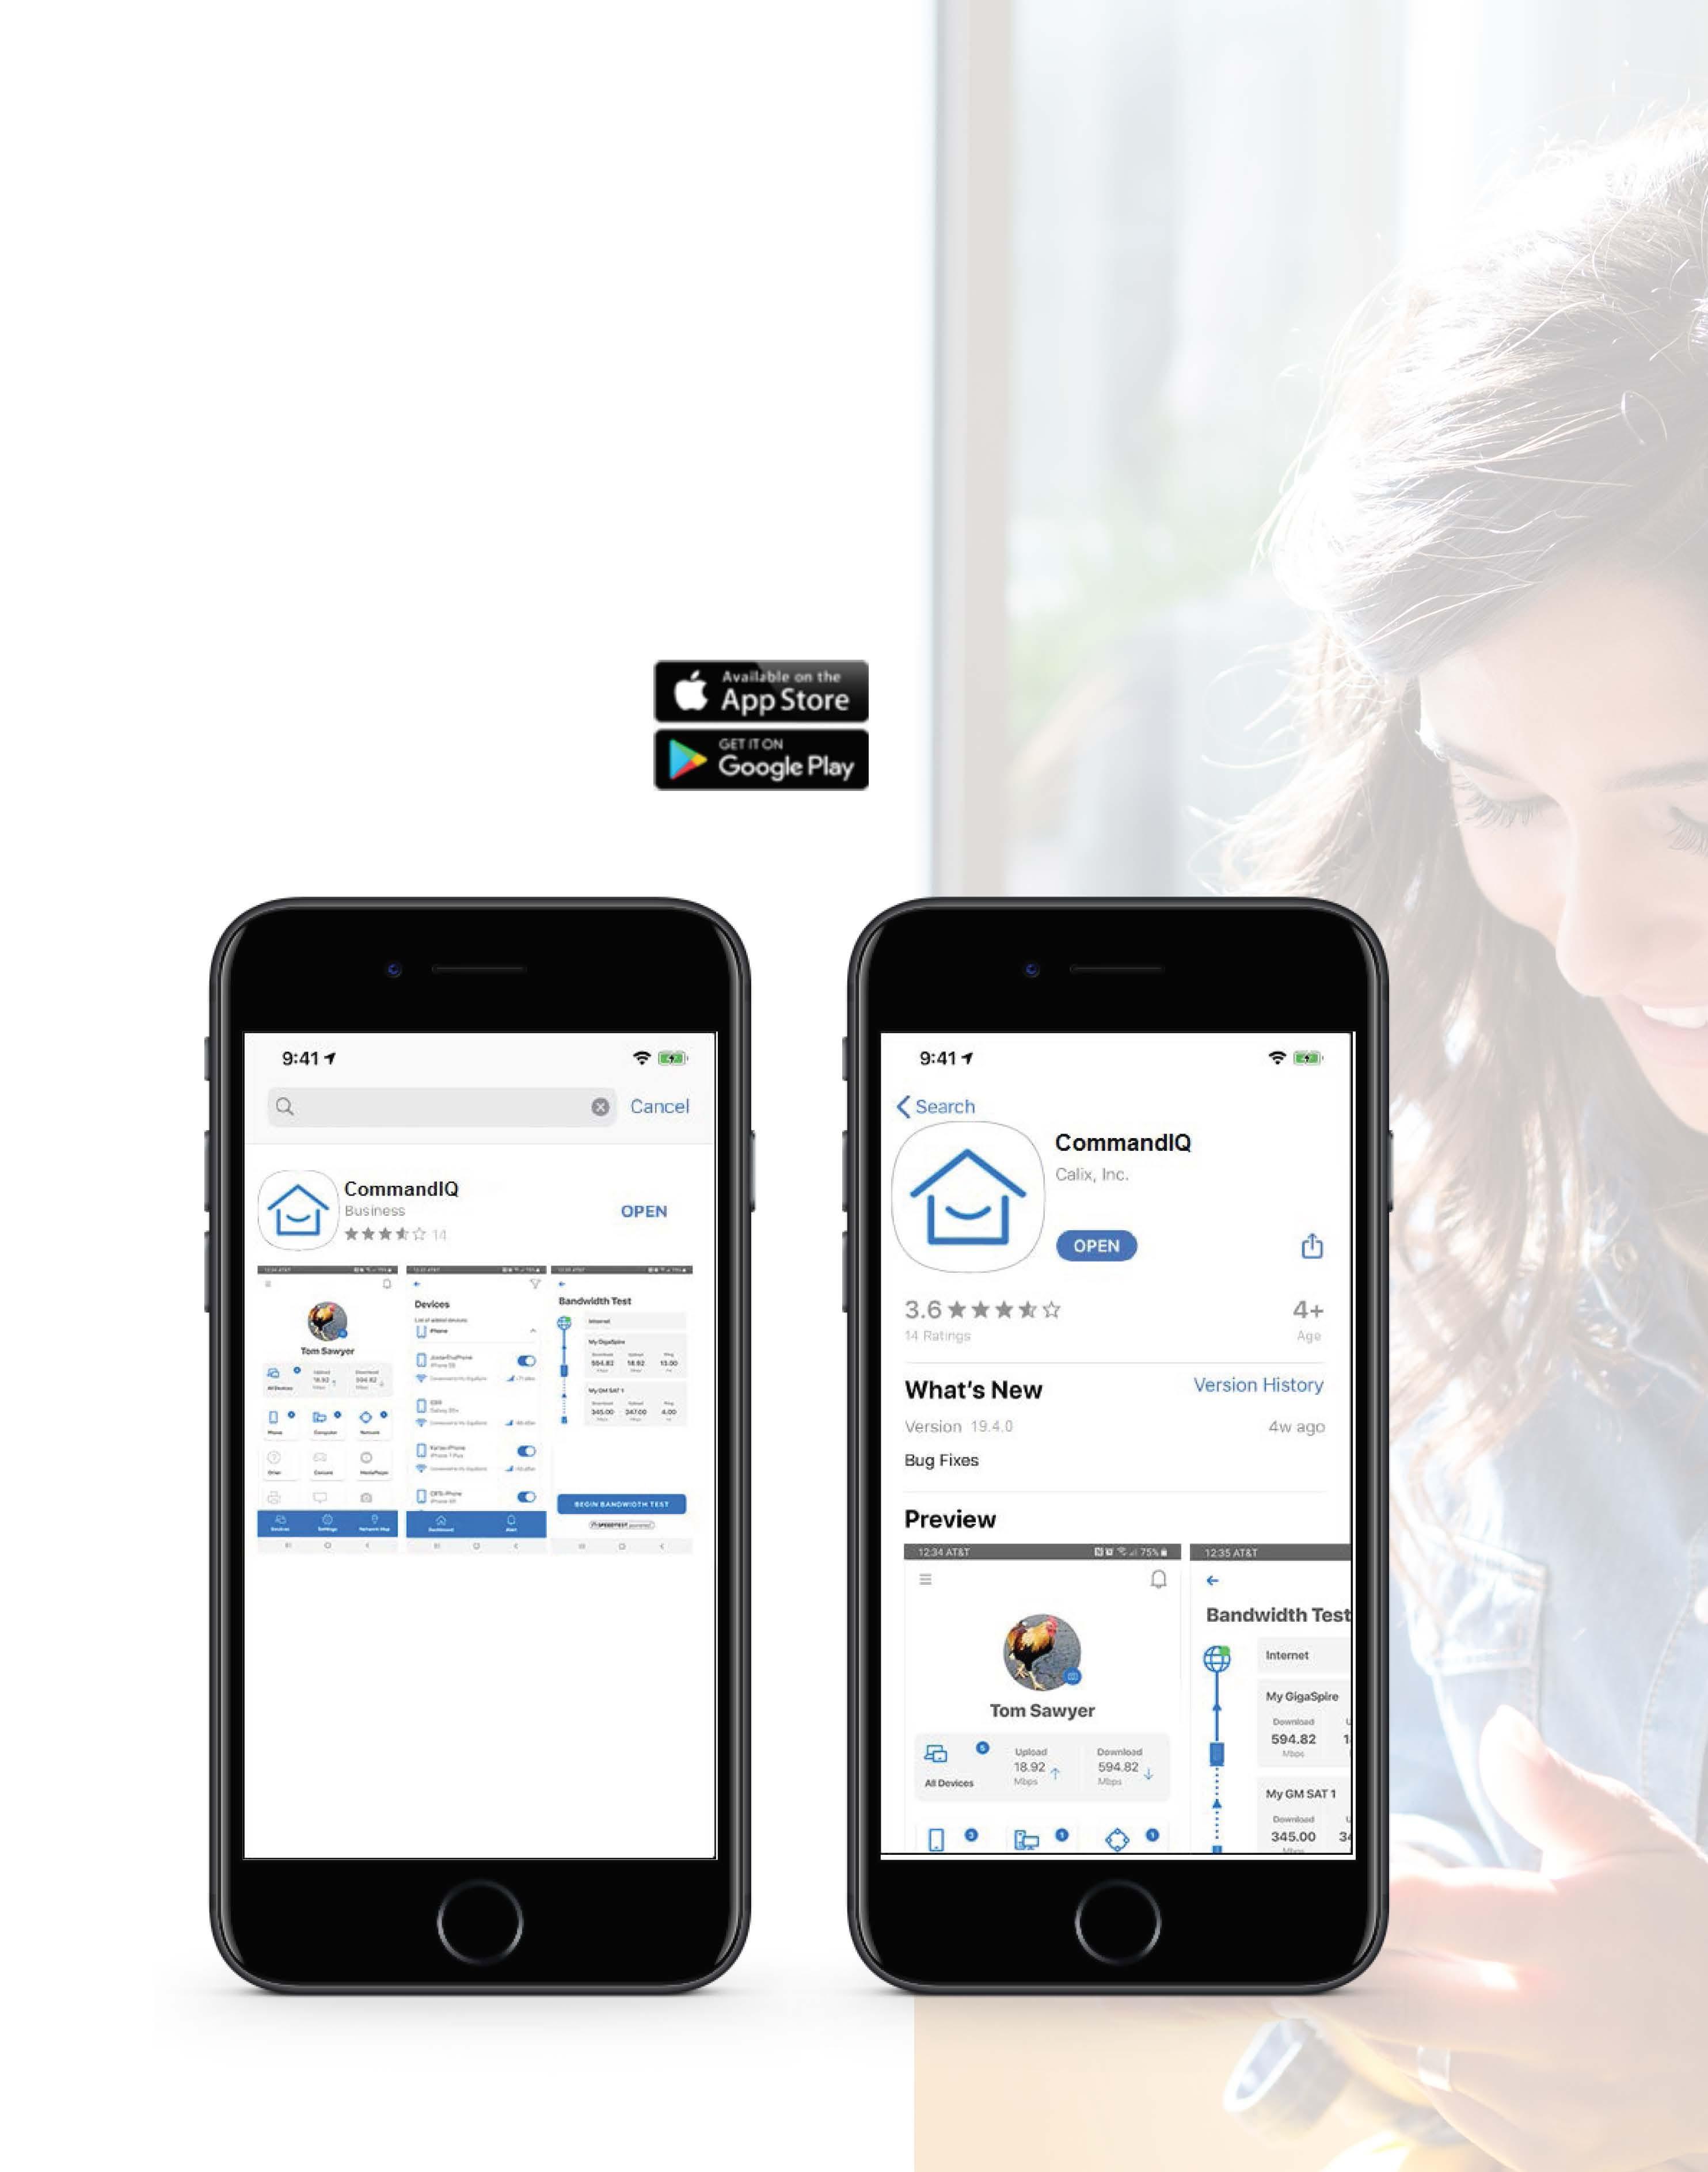 bottom app image